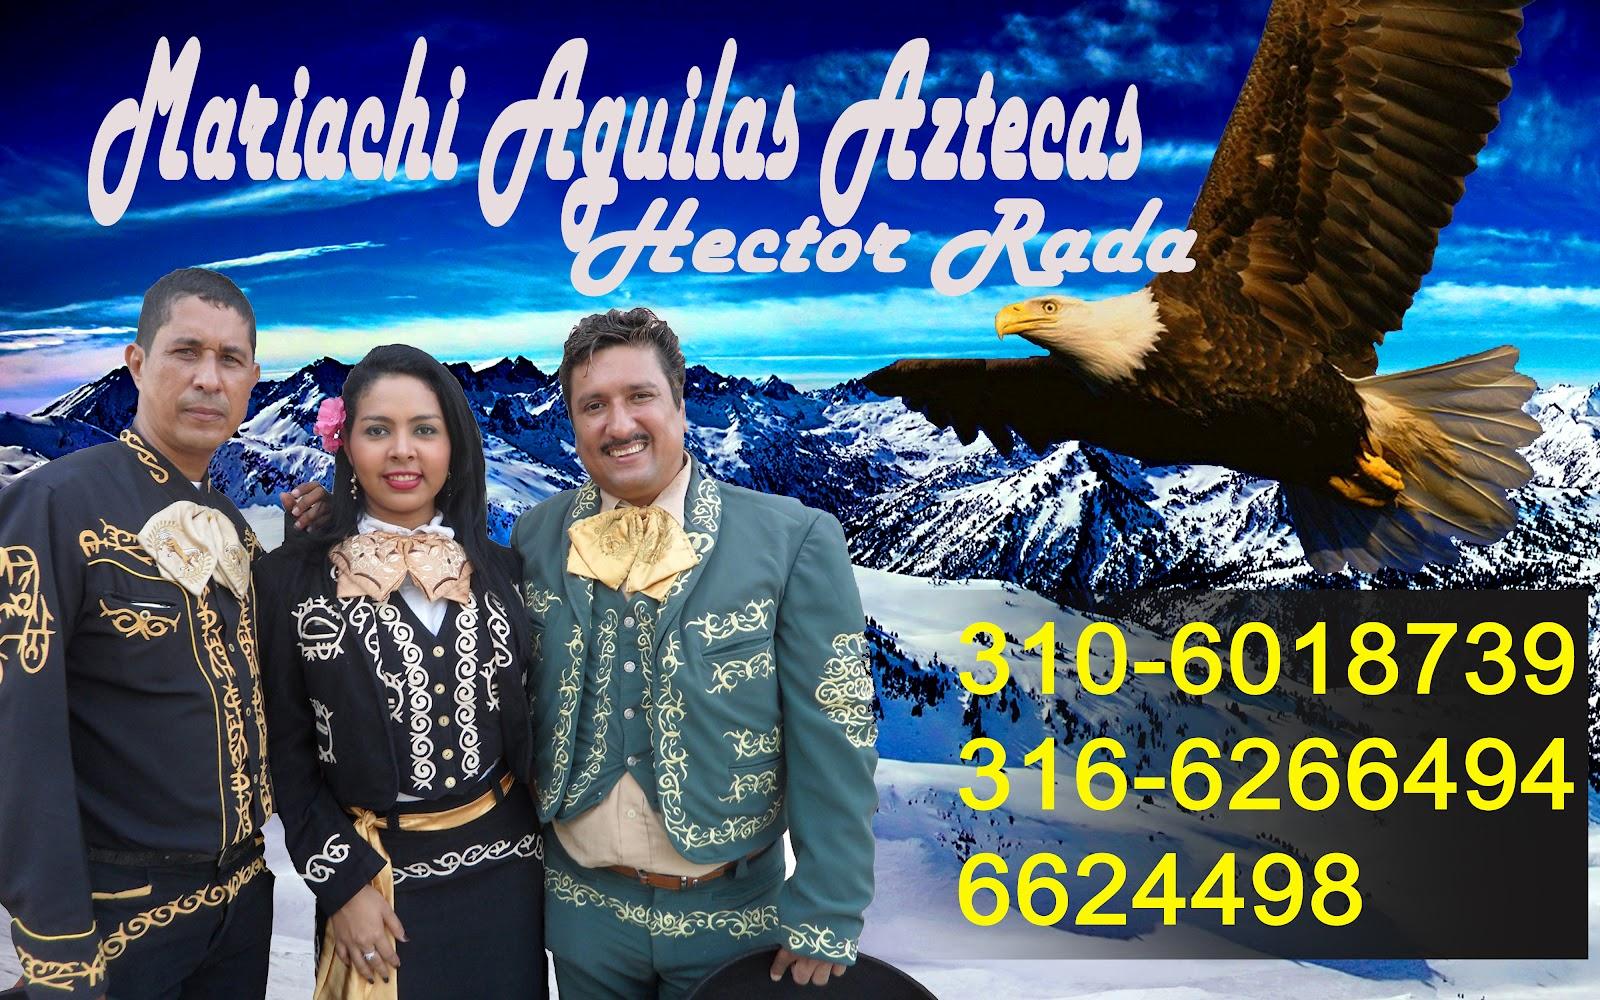 mariachis aguilas aztecas mariachis aguilas aztecas